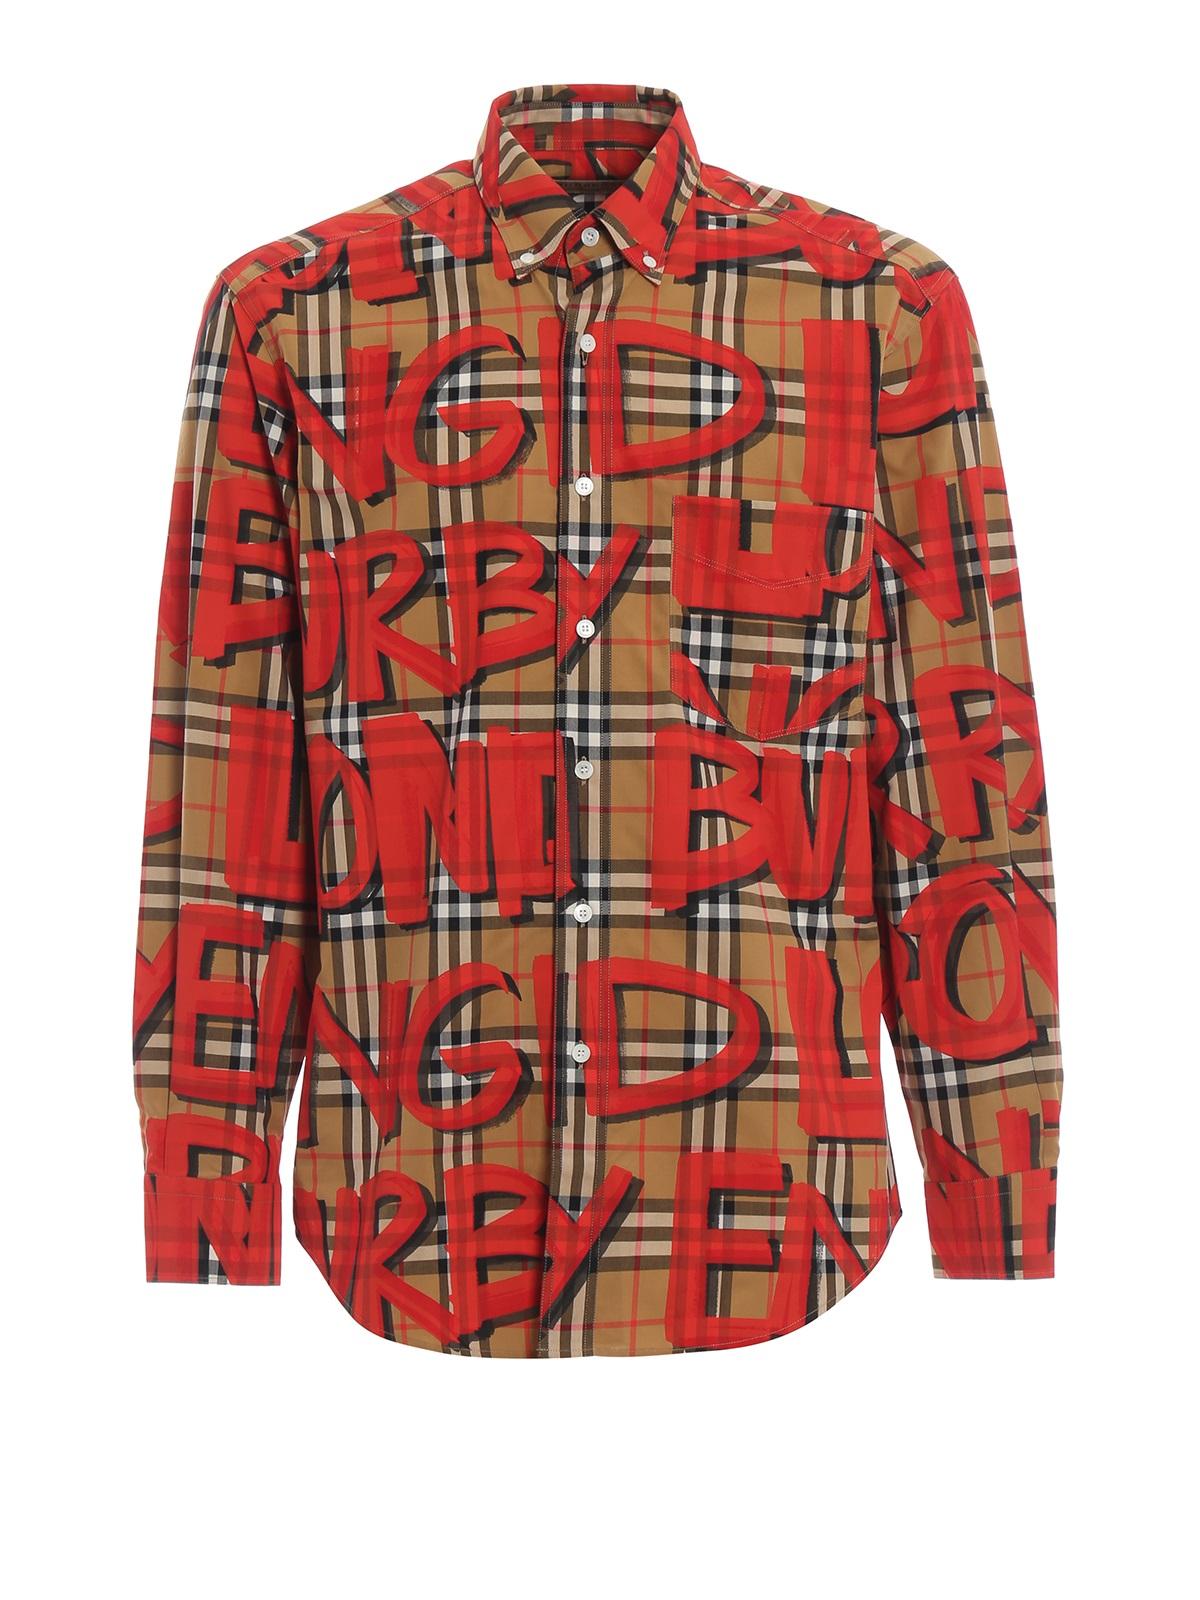 Burberry Mens Graffiti Print Check Cotton Jameson Shirt In N,a